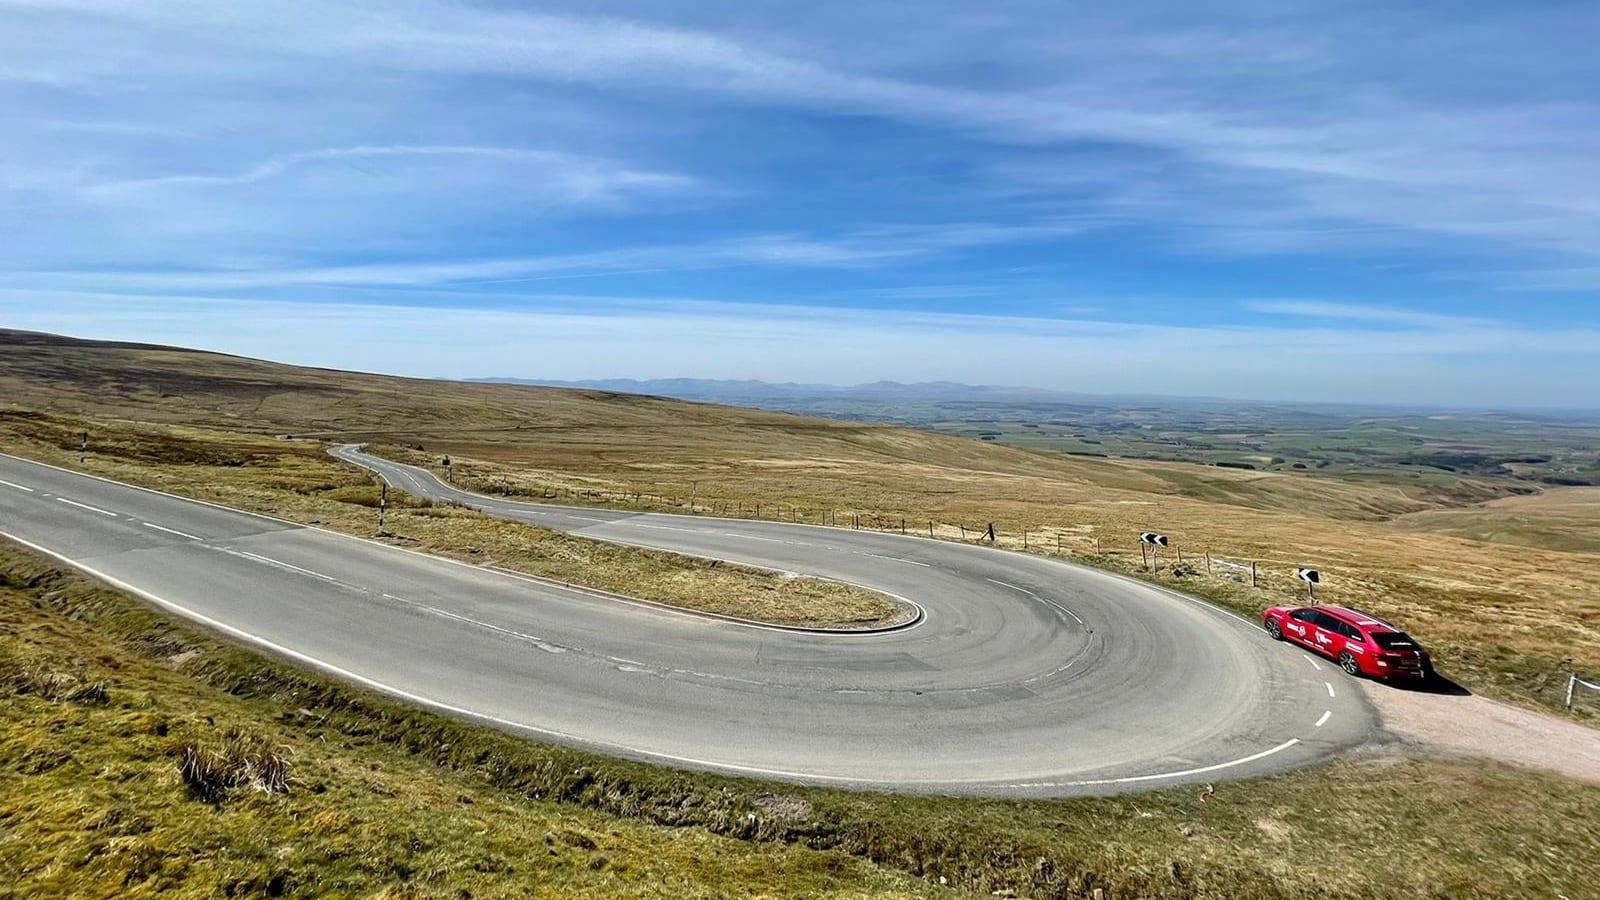 2021 Tour of Britain route